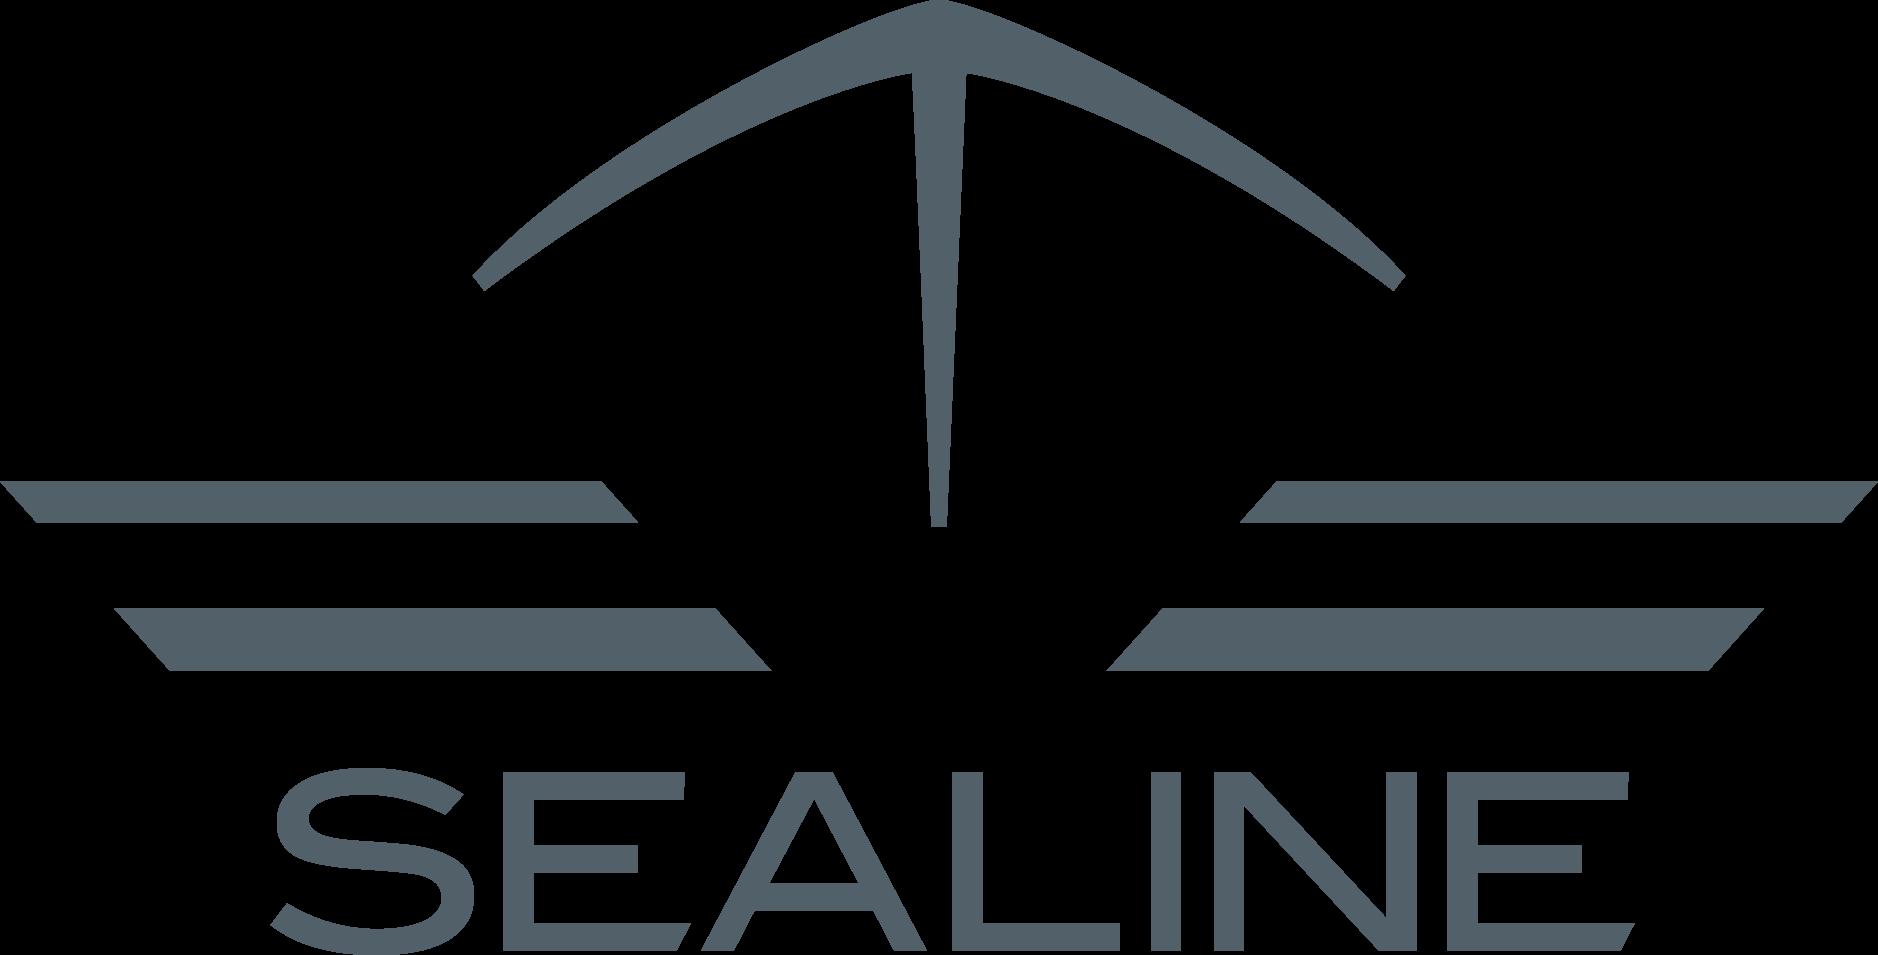 Sealine brand logo